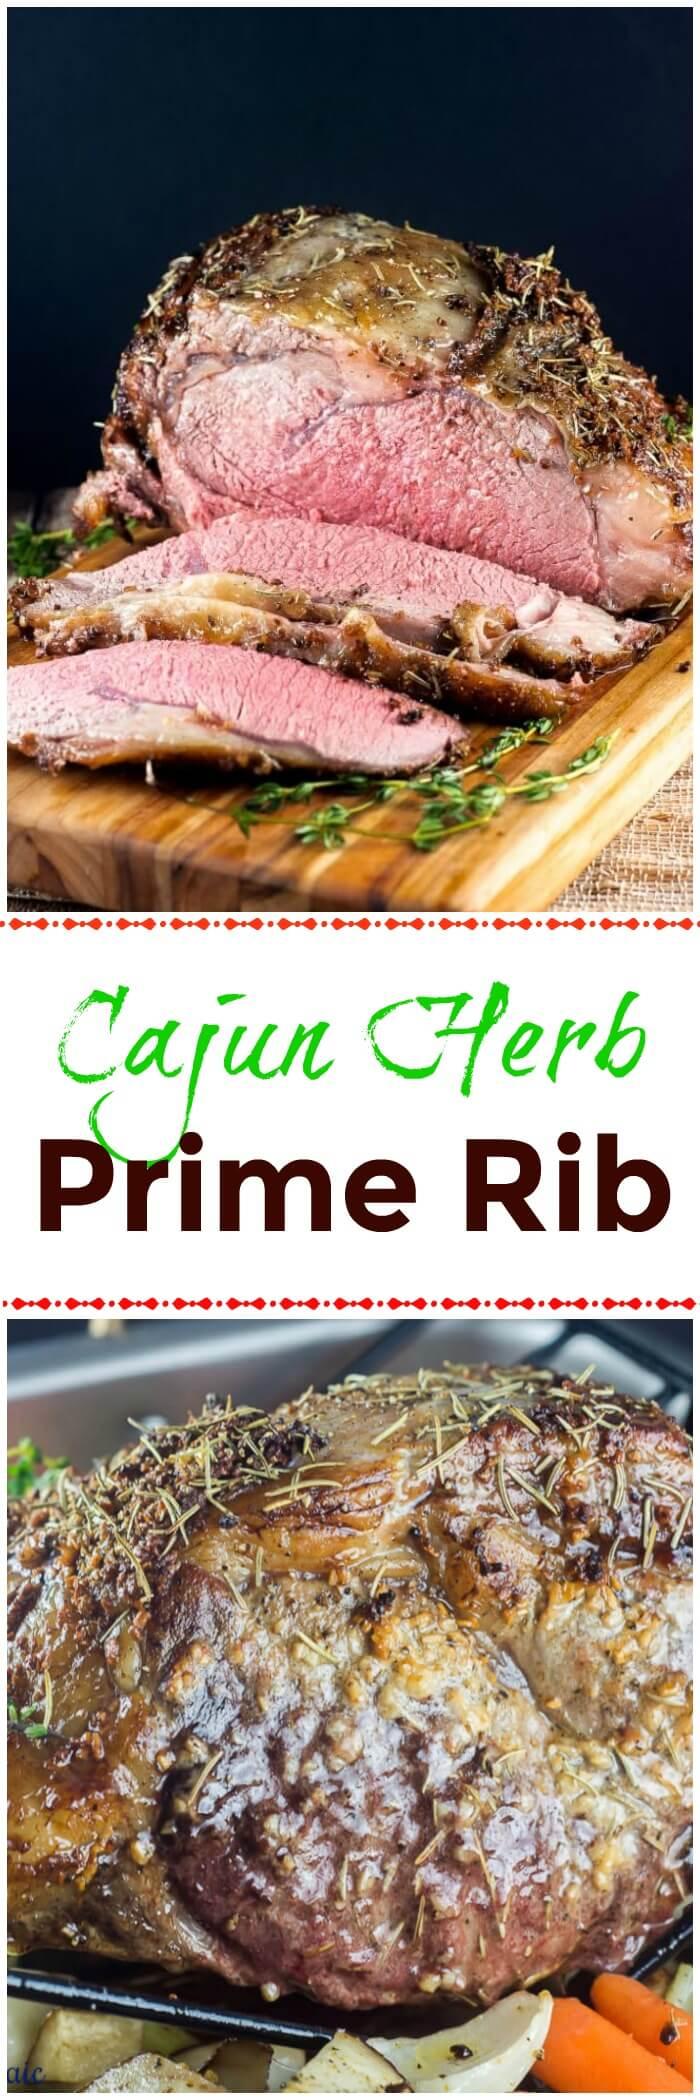 Cajun Herb Prime Rib Ribeye Roast